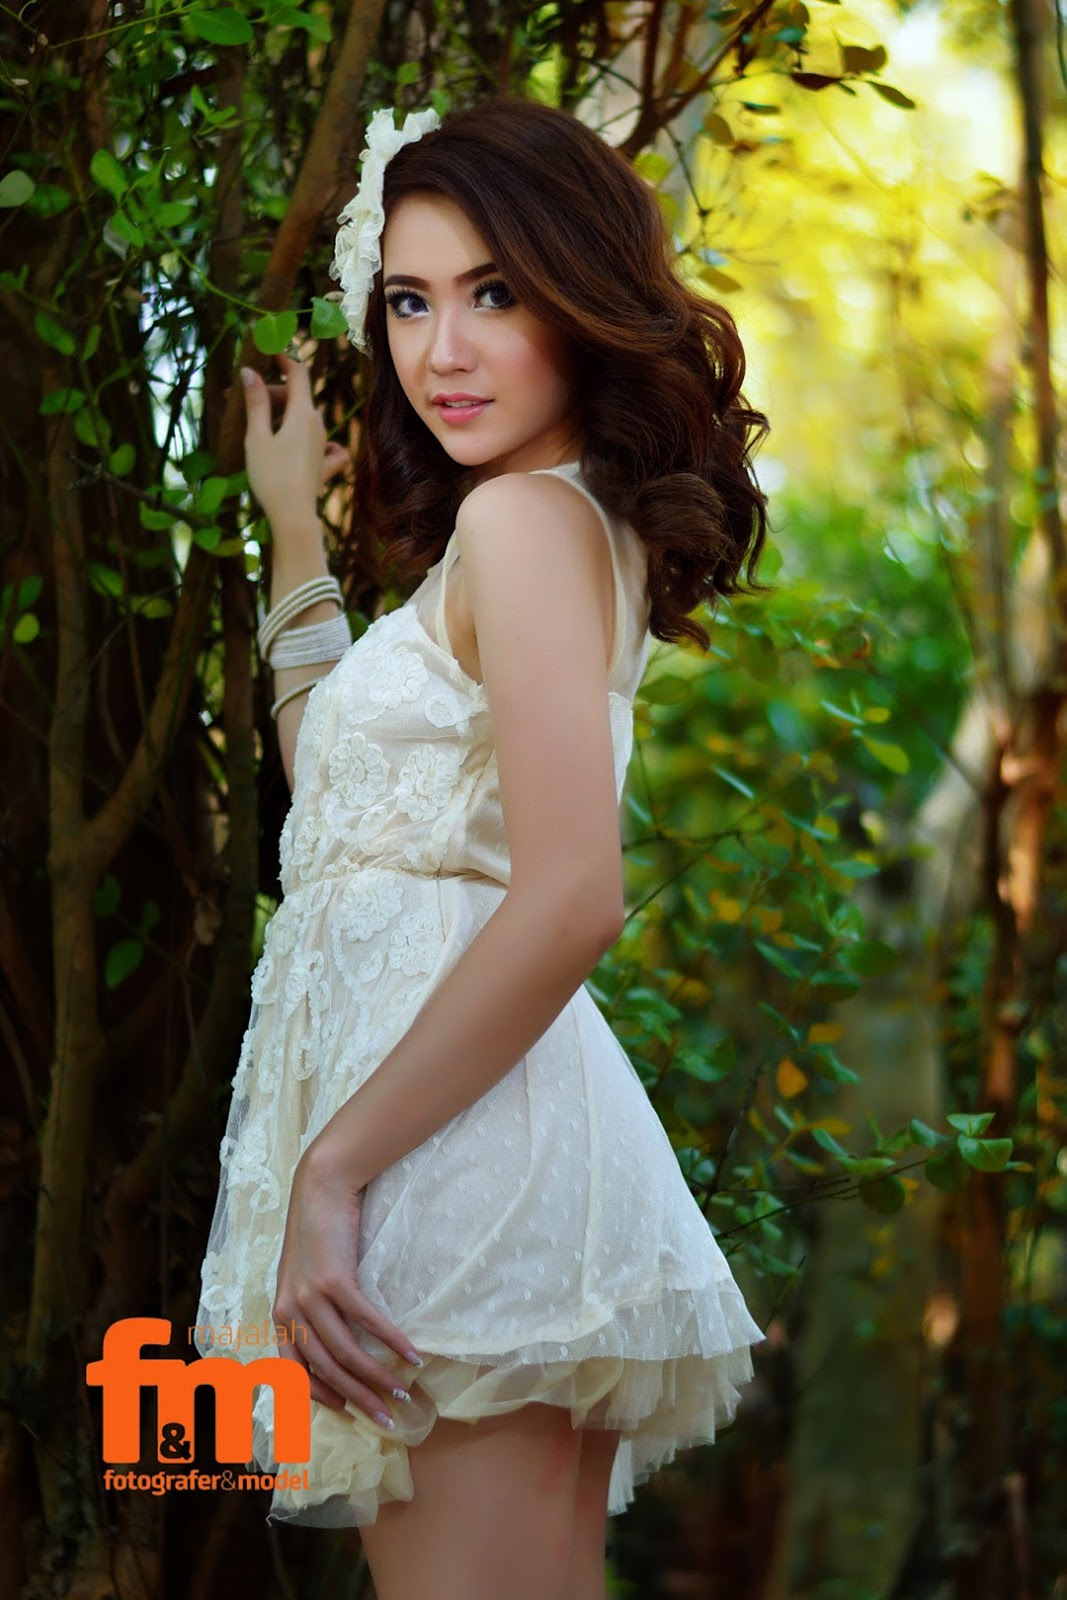 konsep foto Model Winny Valencia baju pengantin